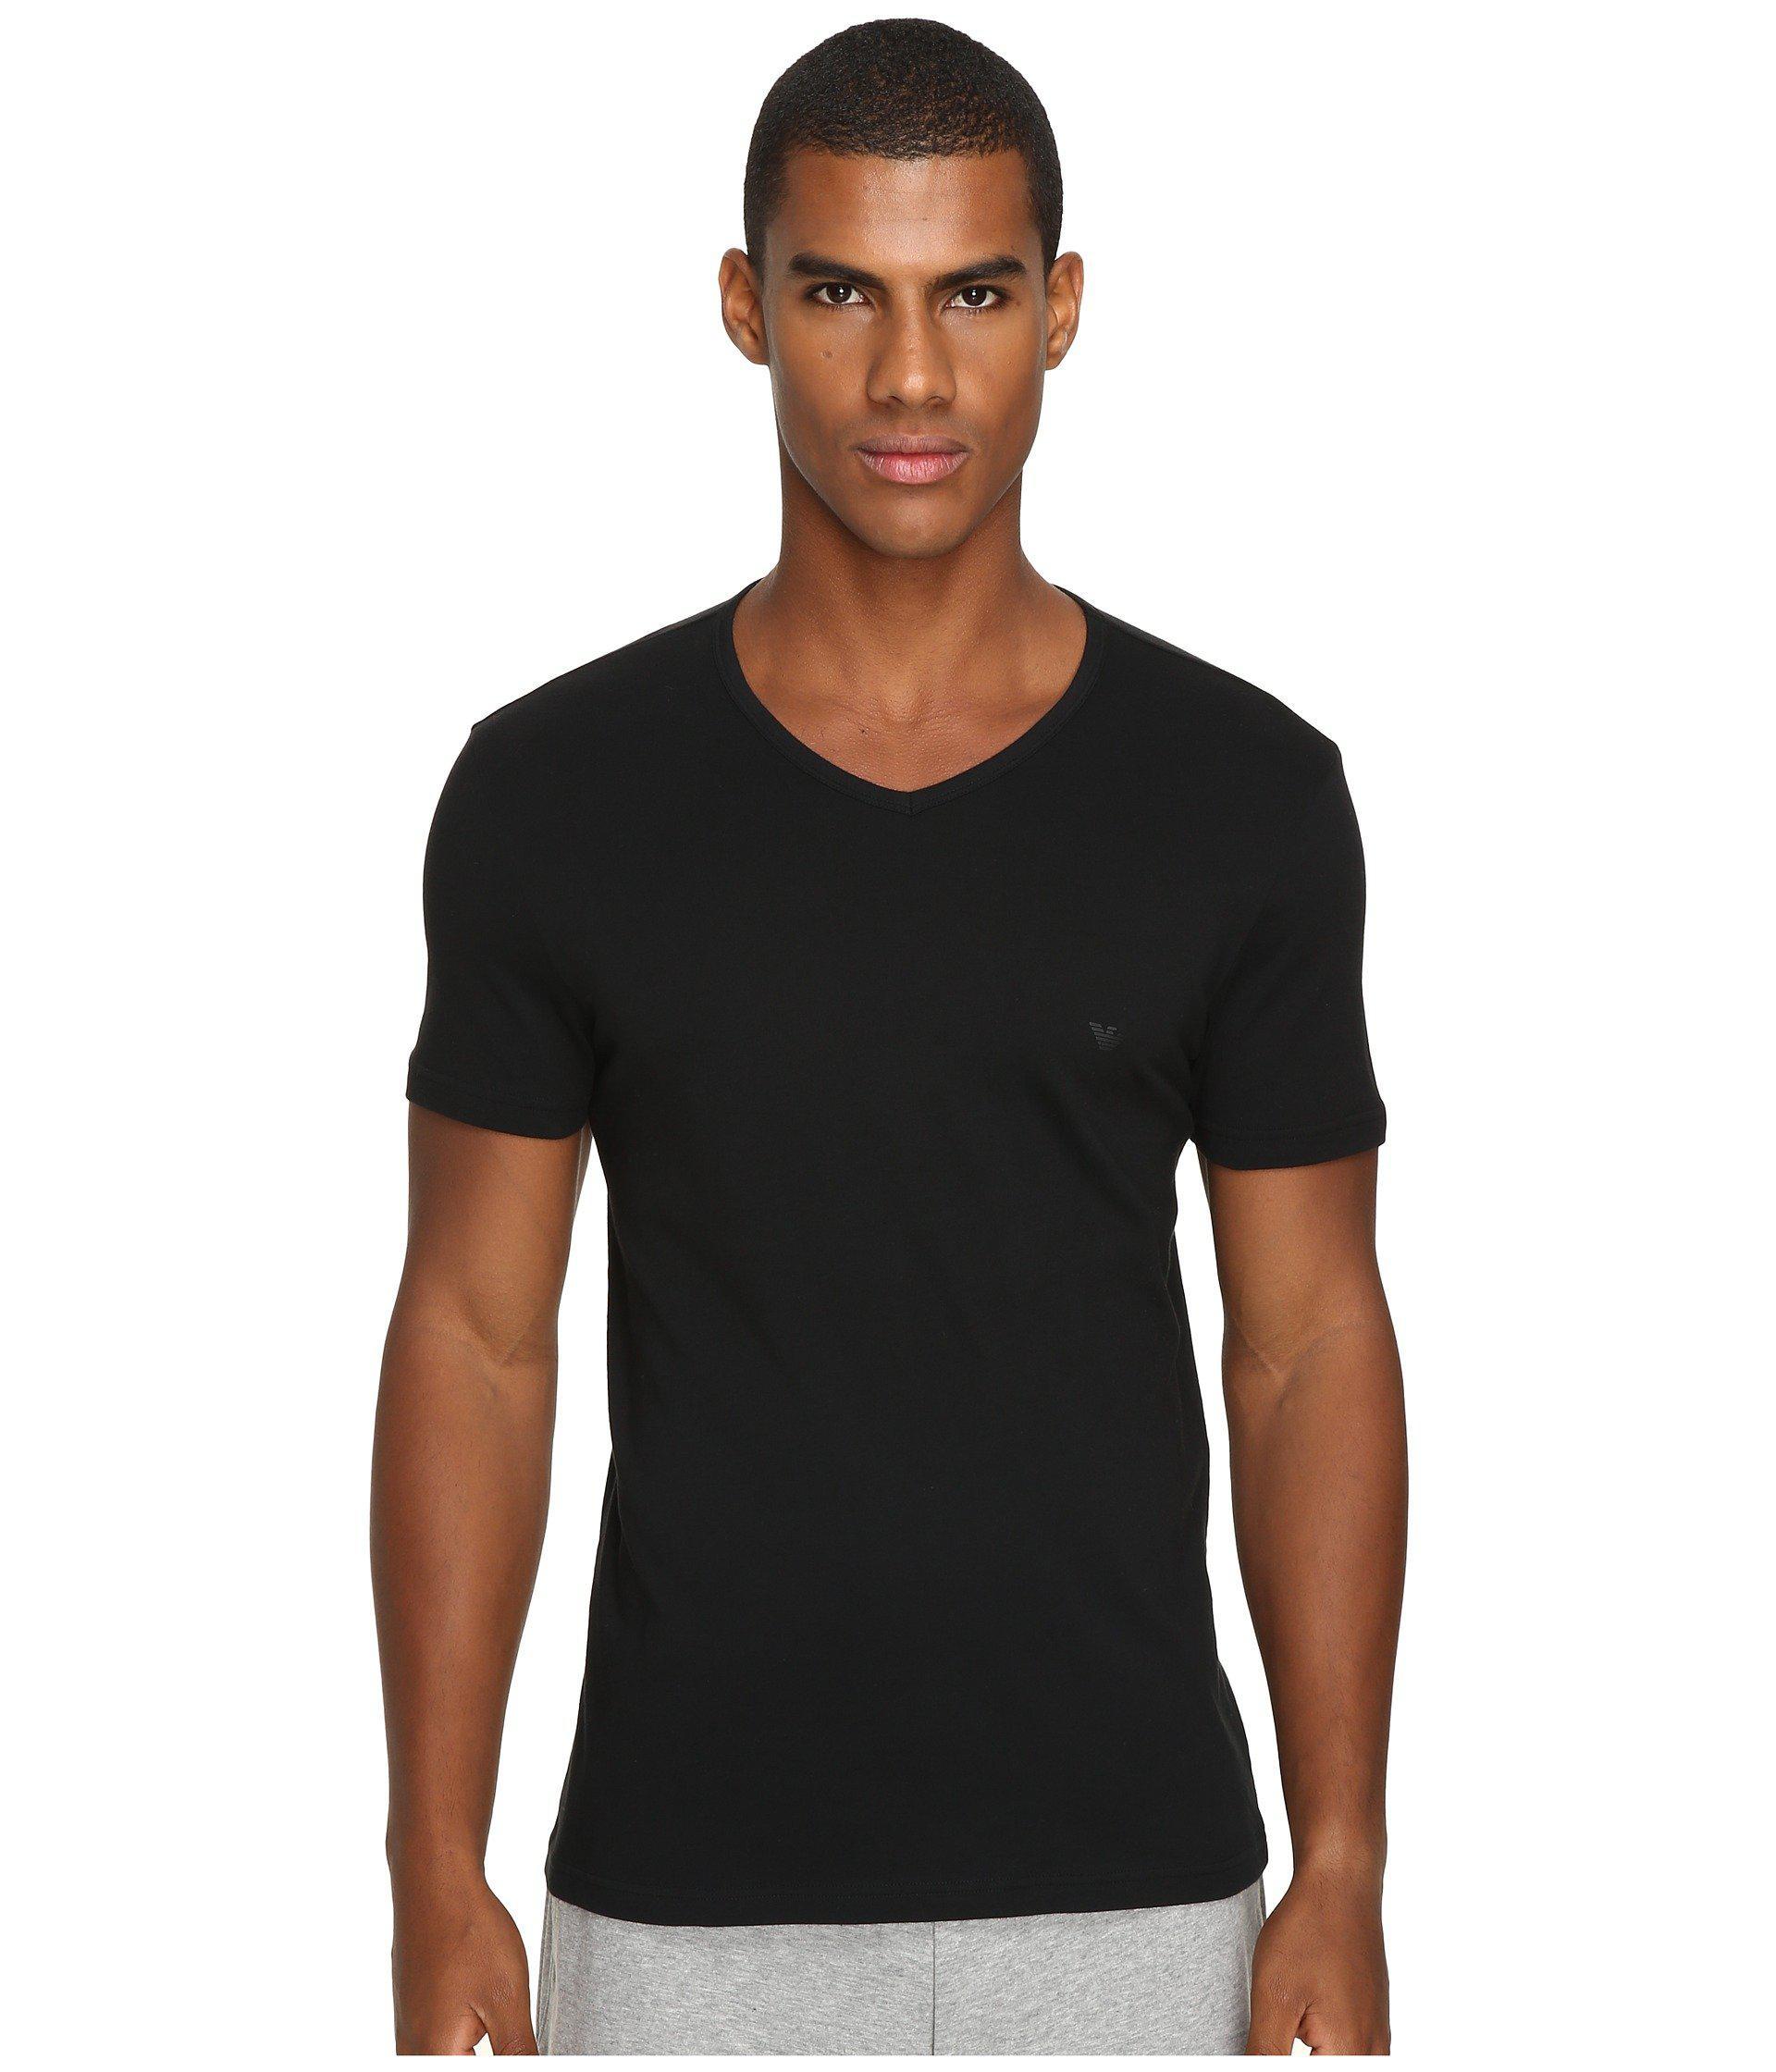 80eab8f27a26 Lyst - Emporio Armani 3-pack V-neck T-shirt (black black black) Men s T  Shirt in Black for Men